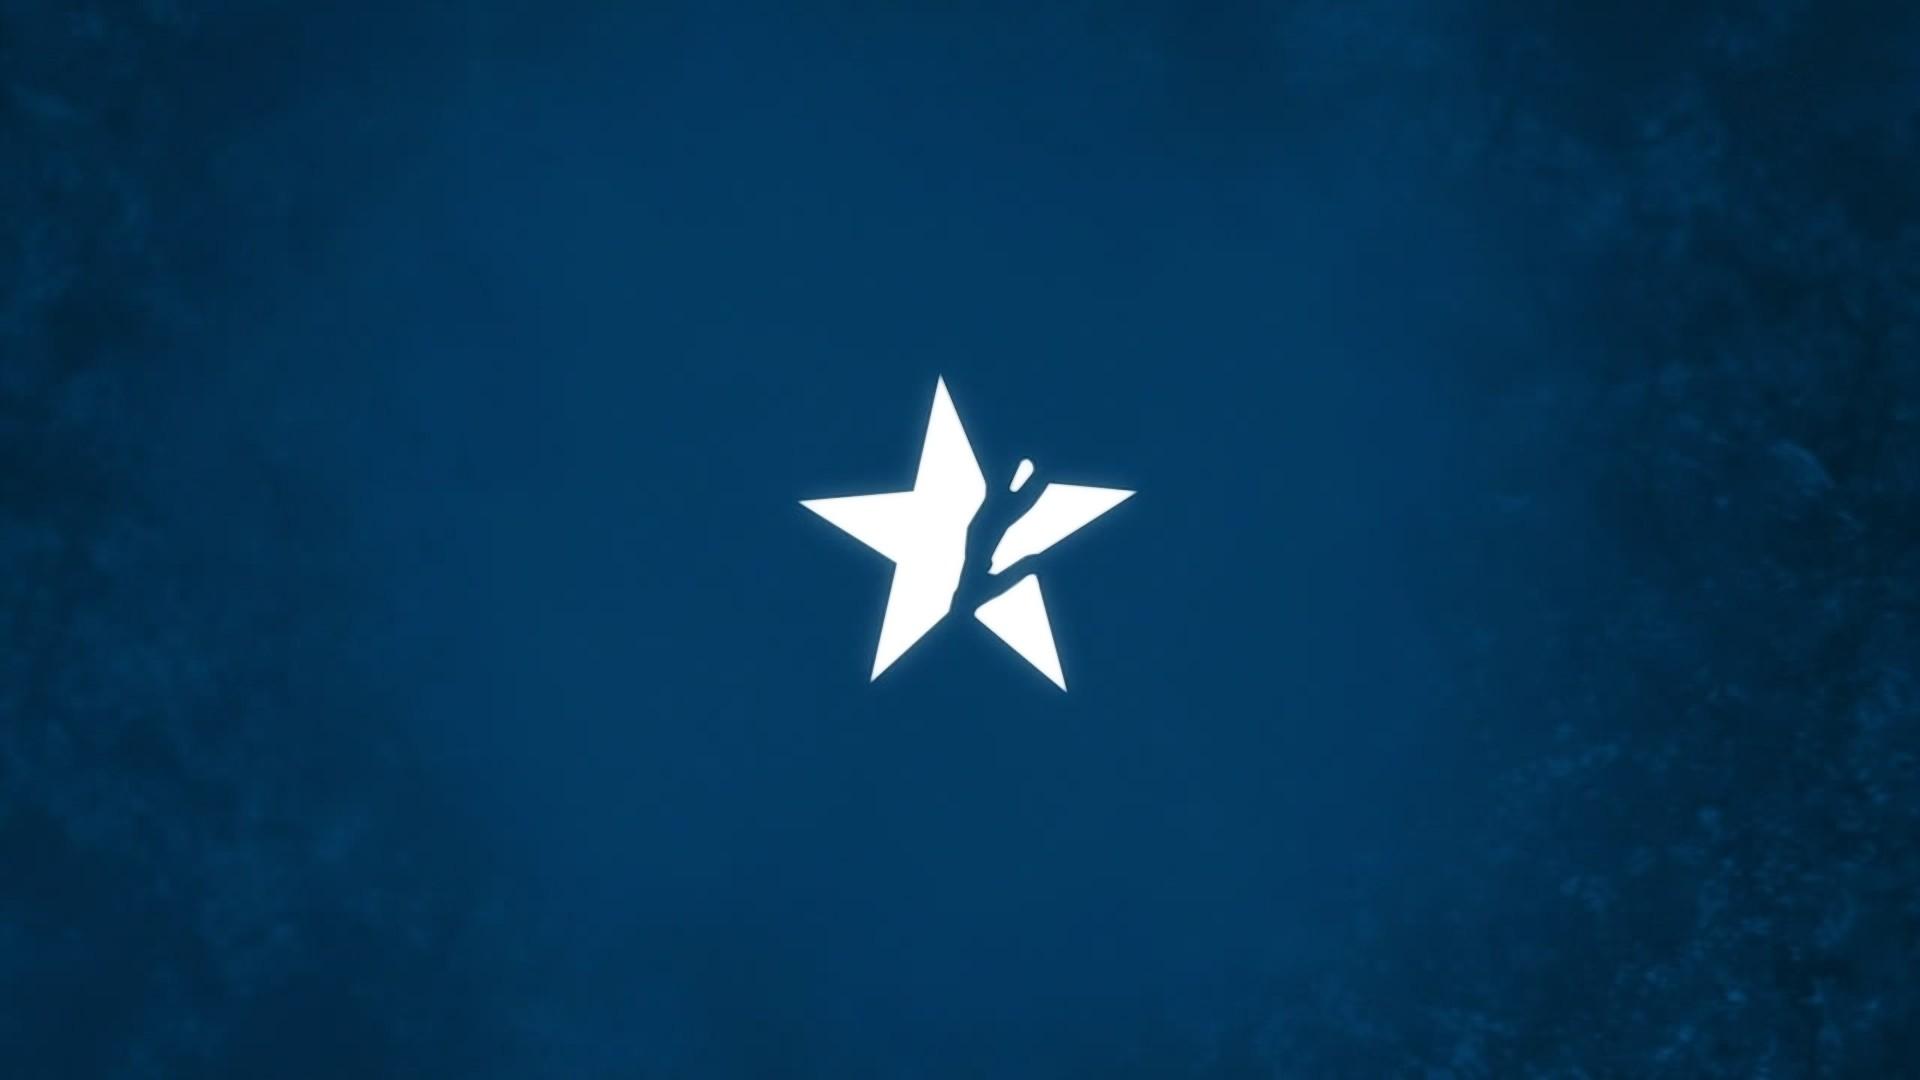 blue minimalistic black rock shooter stars broken symbol insane black rock  shooter wall Art HD